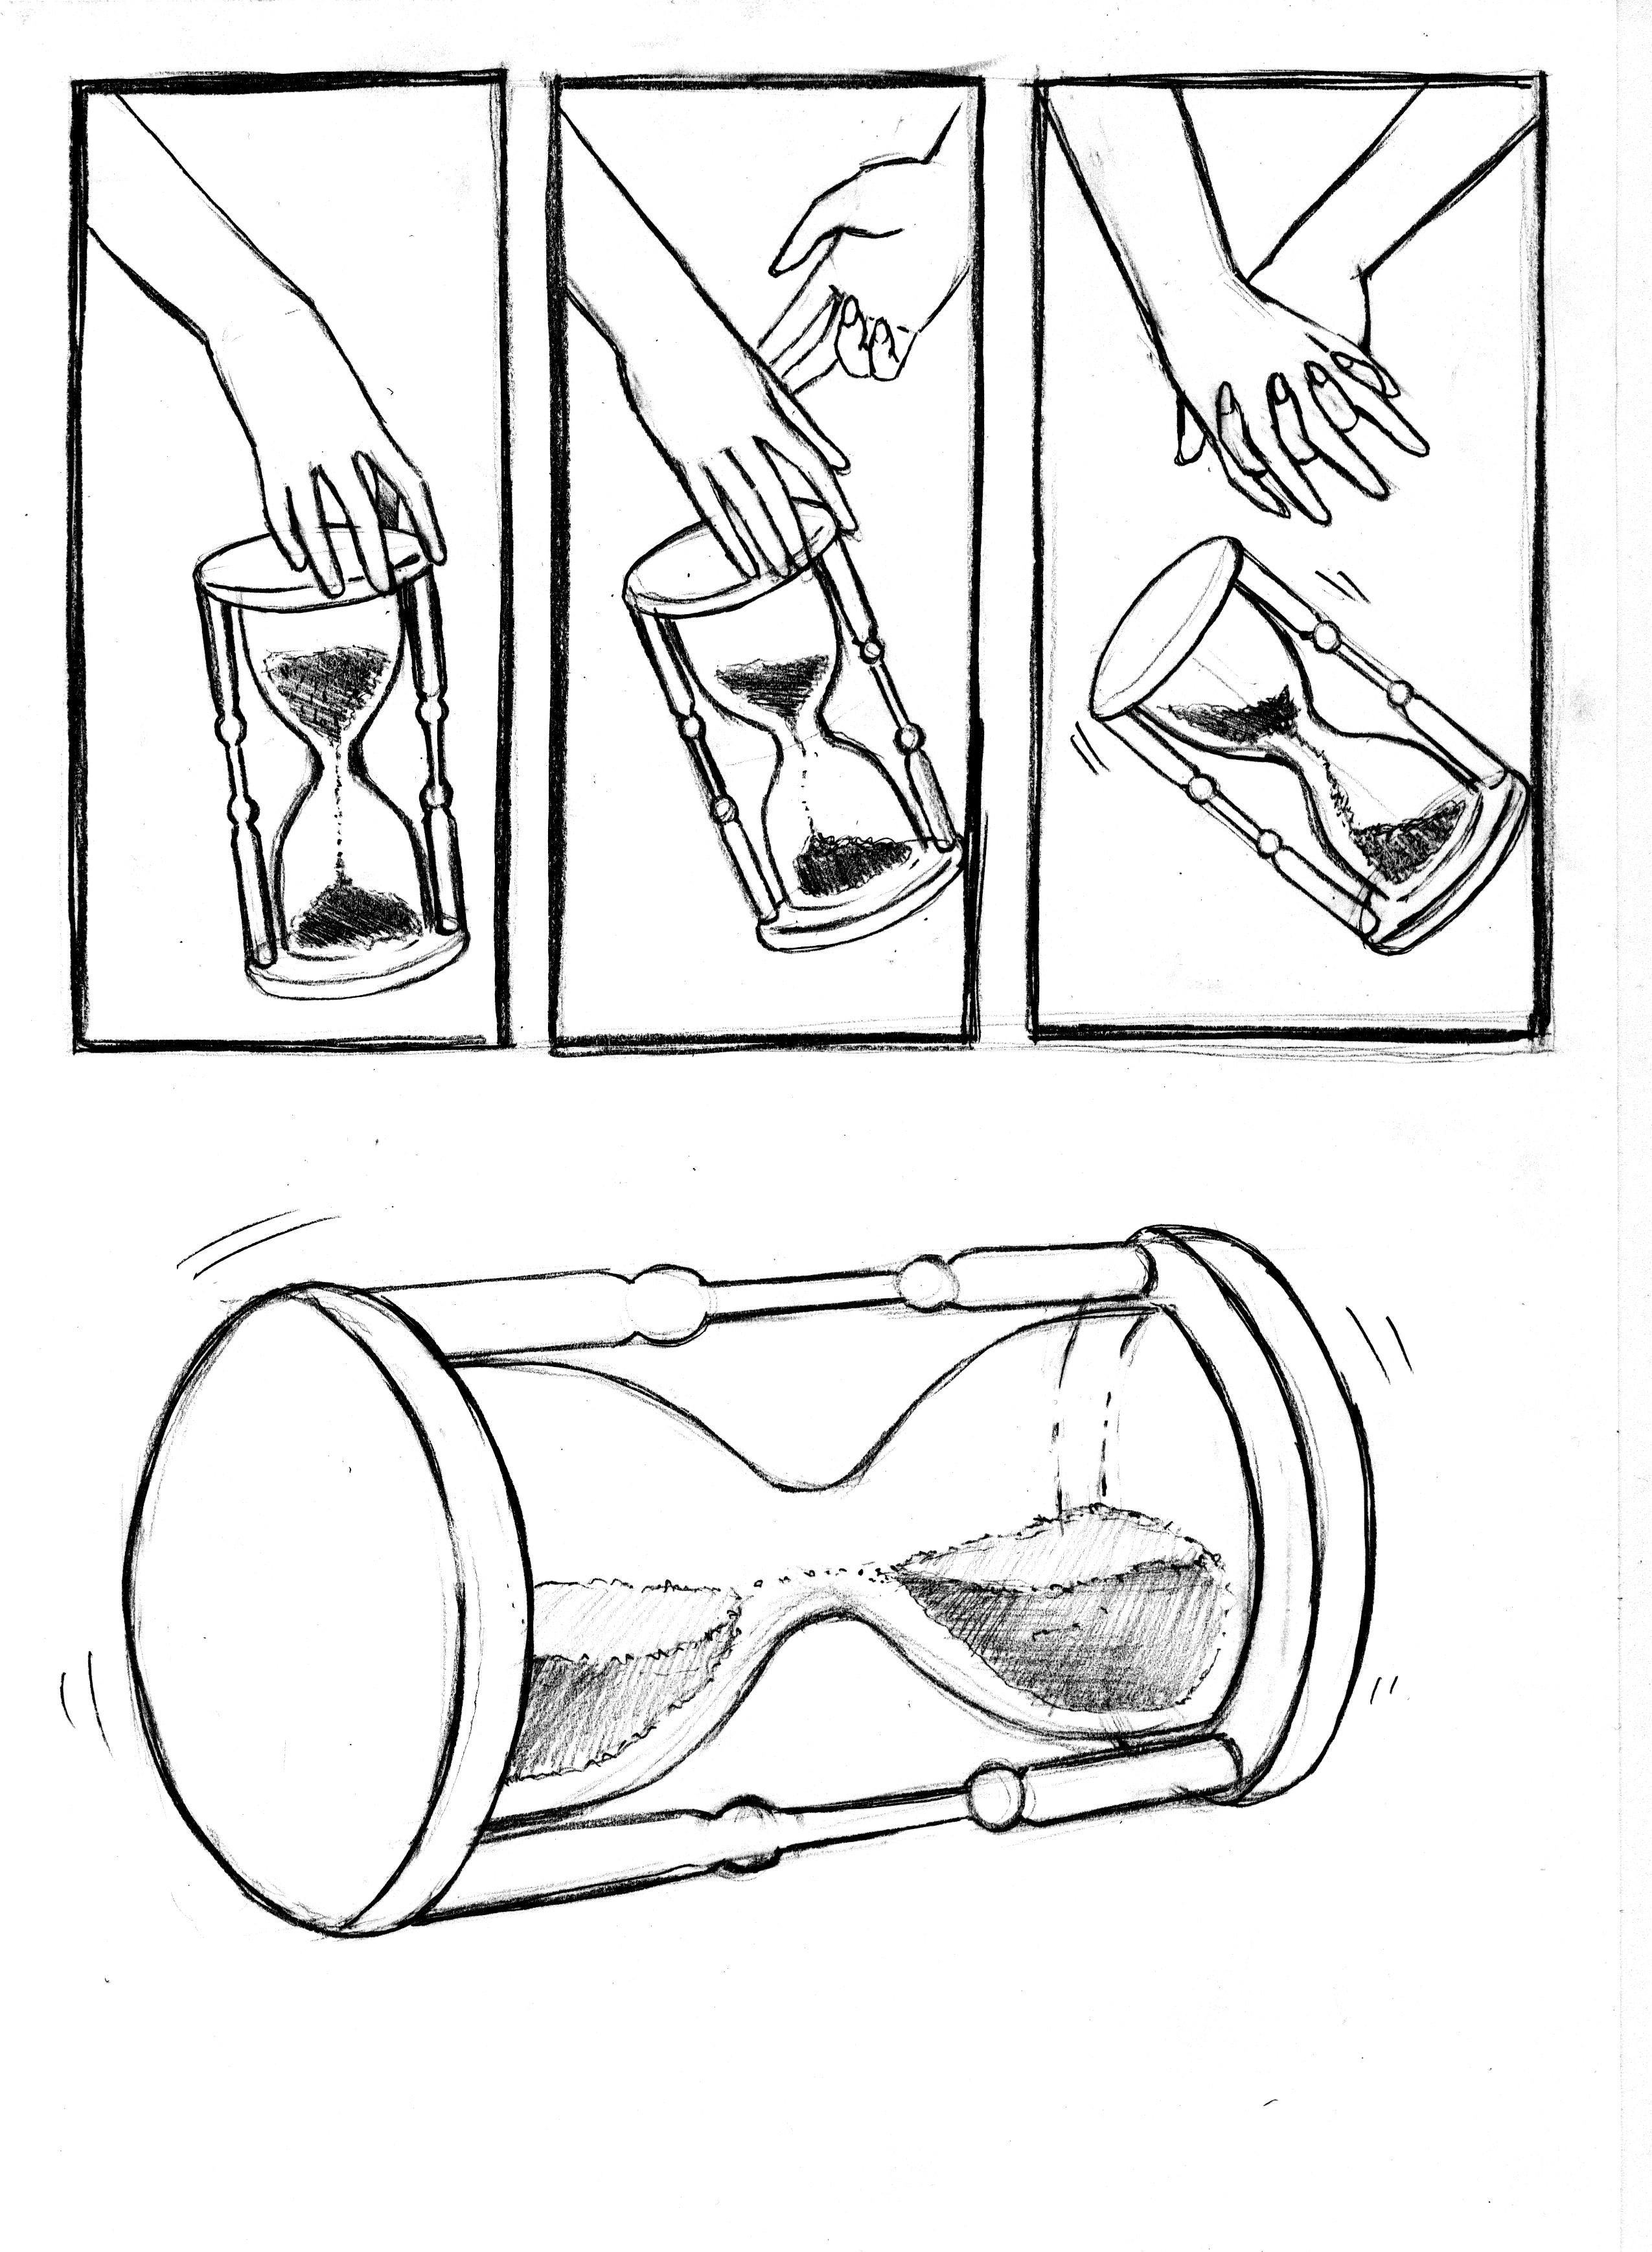 Matador Coloring Page Pages Sketch Coloring Page